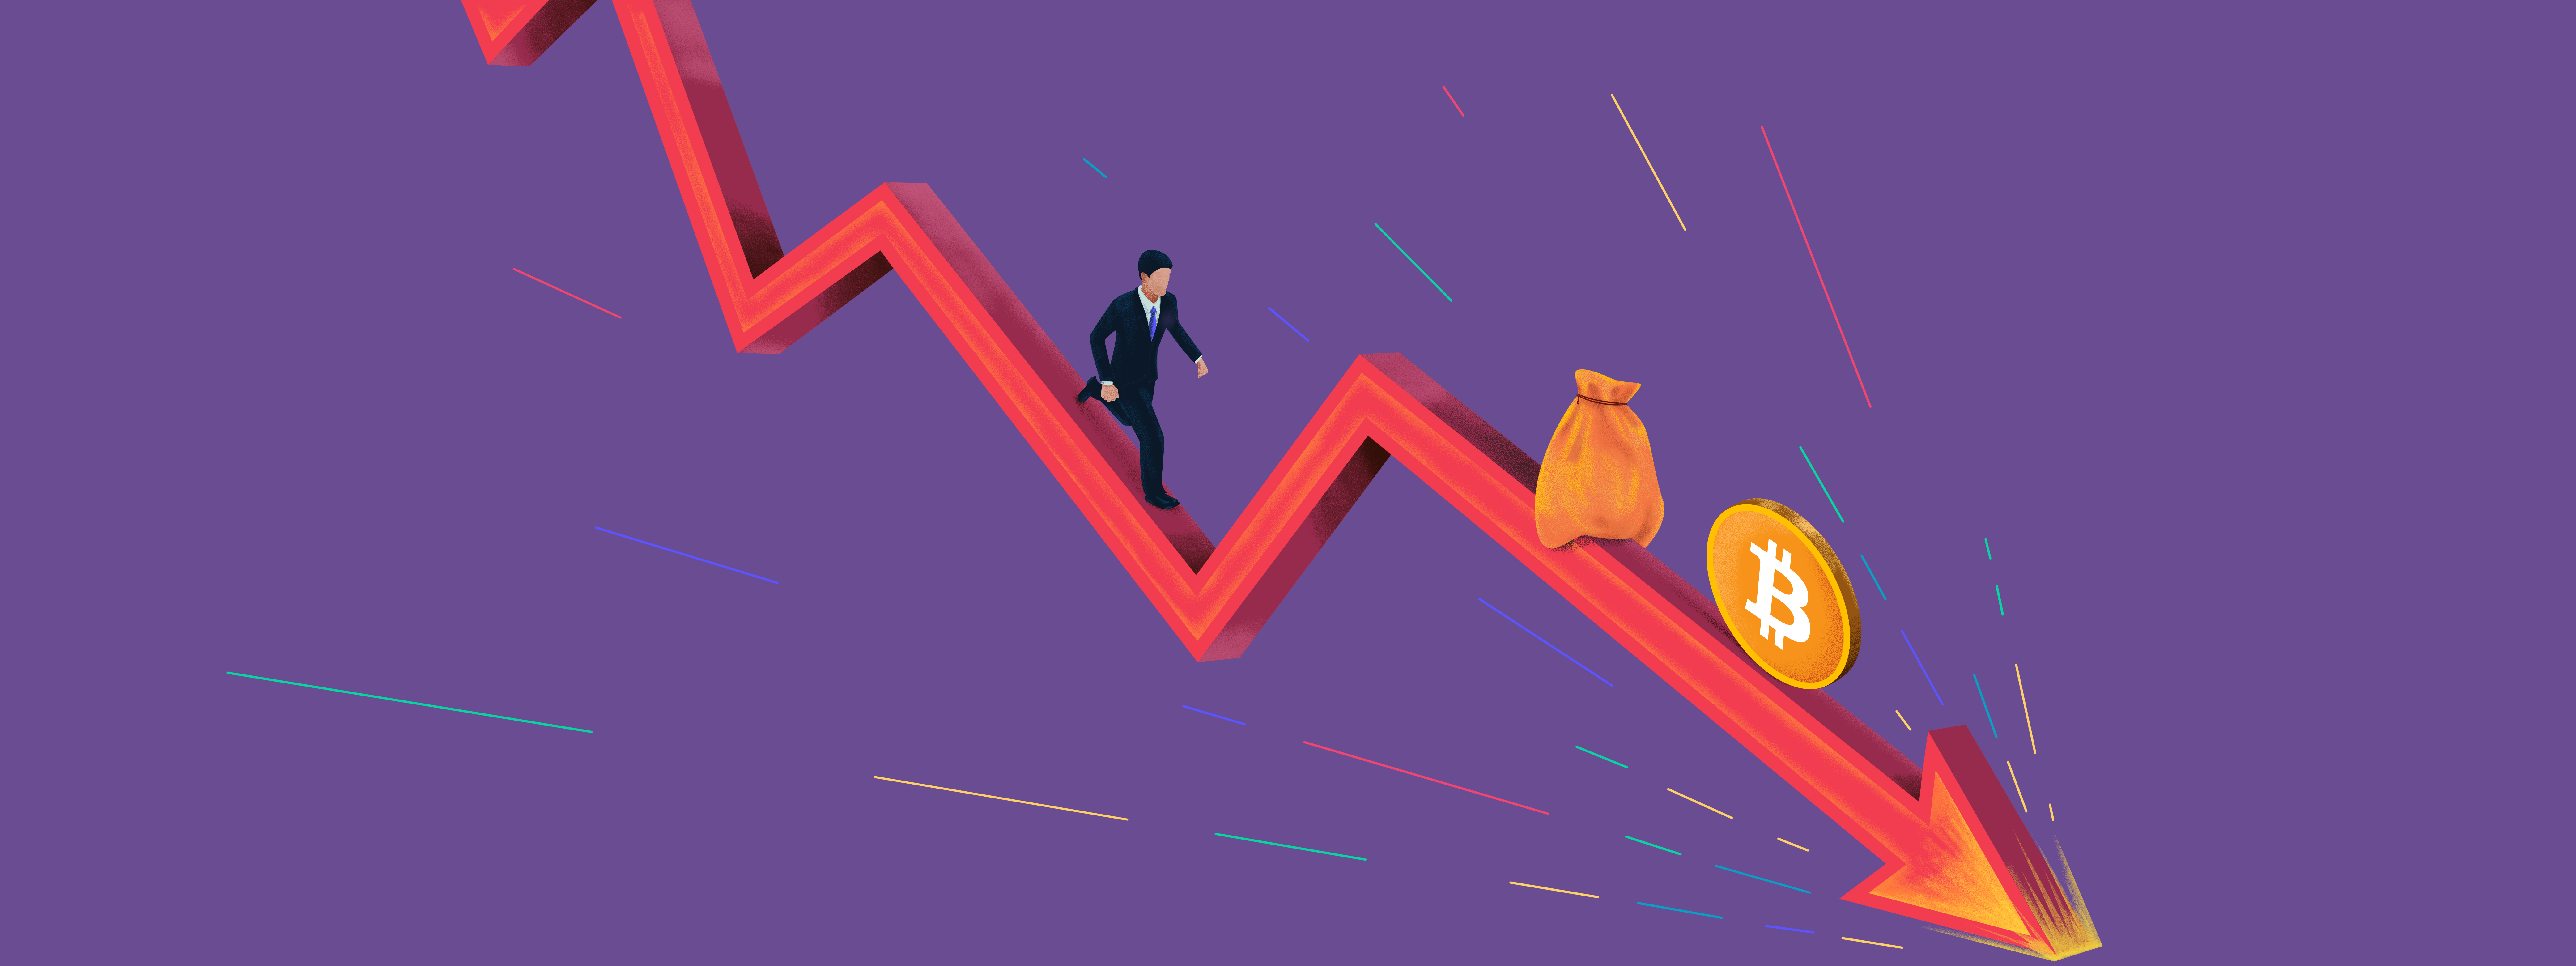 Why Retail Investors Lose Money